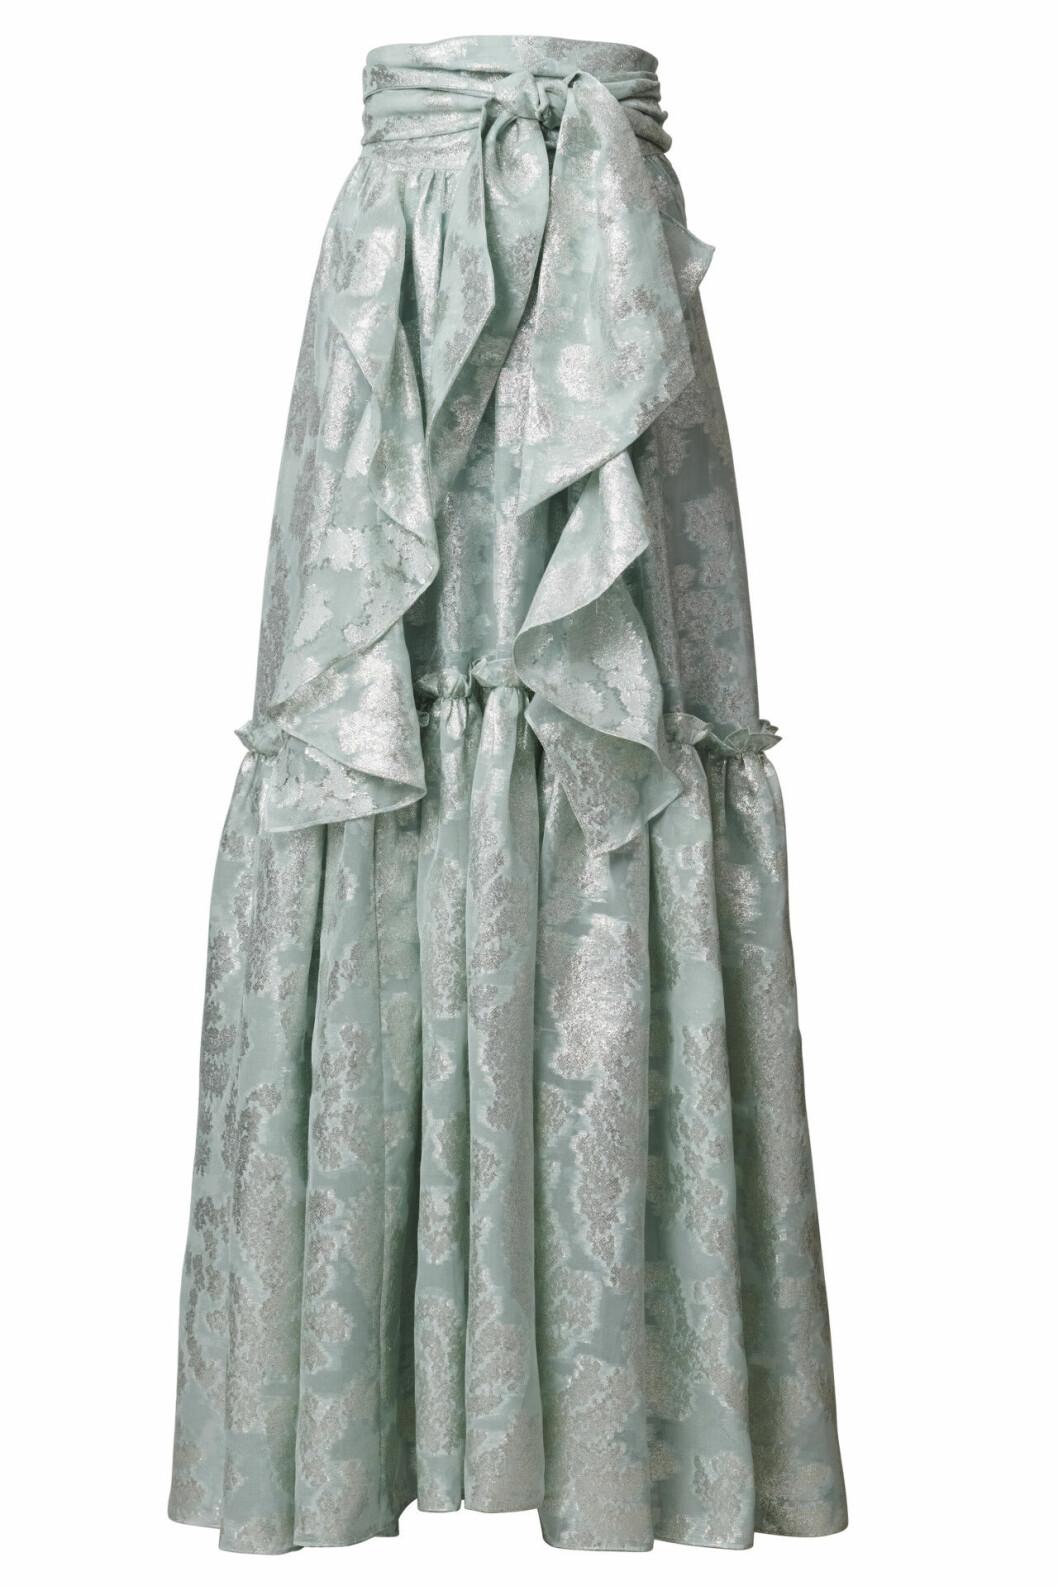 H&M Conscious Exclusive 2019 lång ljusgrön kjol